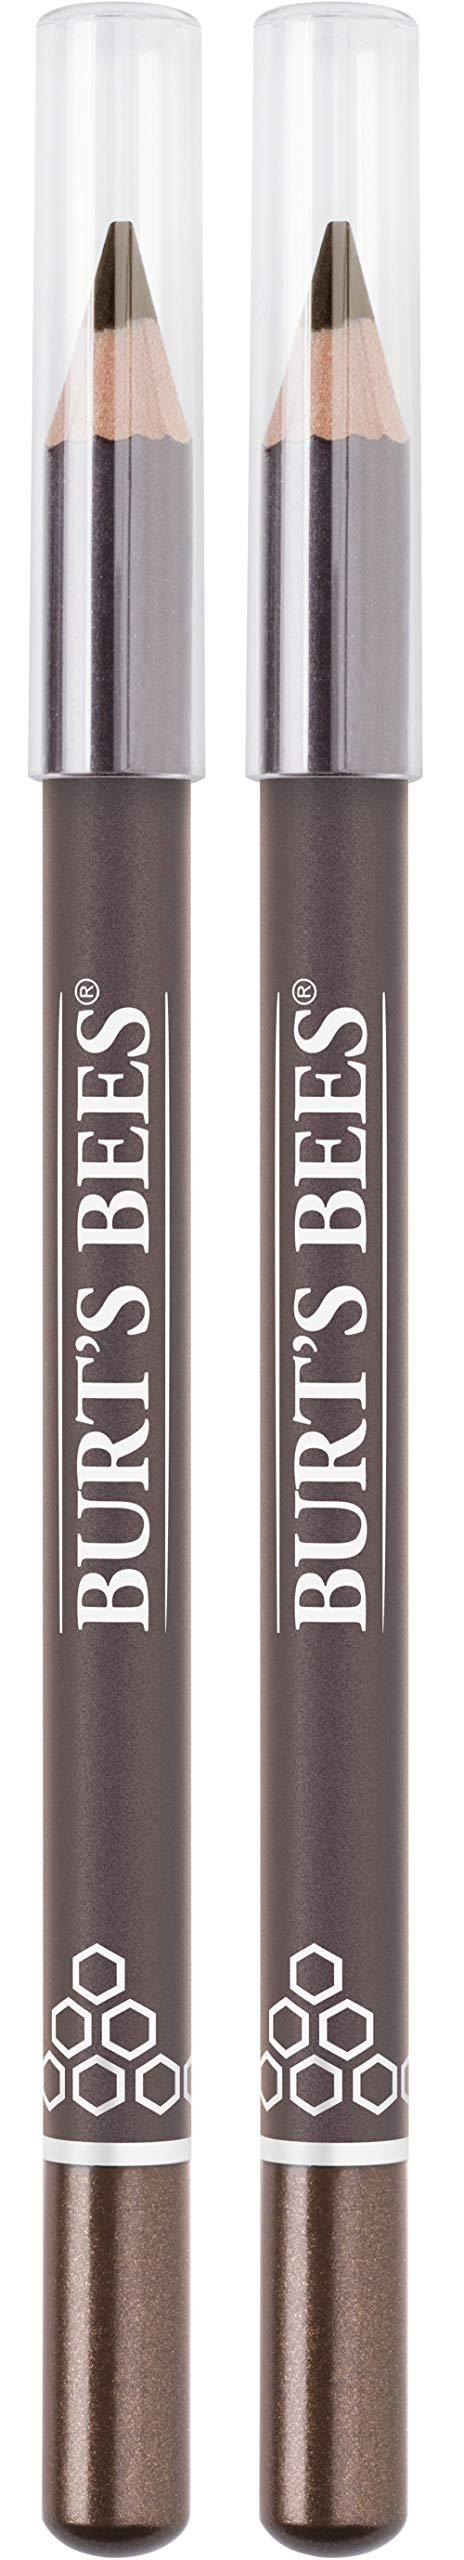 Burt's Bees Nourishing Eyeliner, Warm Brown - 0.04 Ounce (Pack of 2)